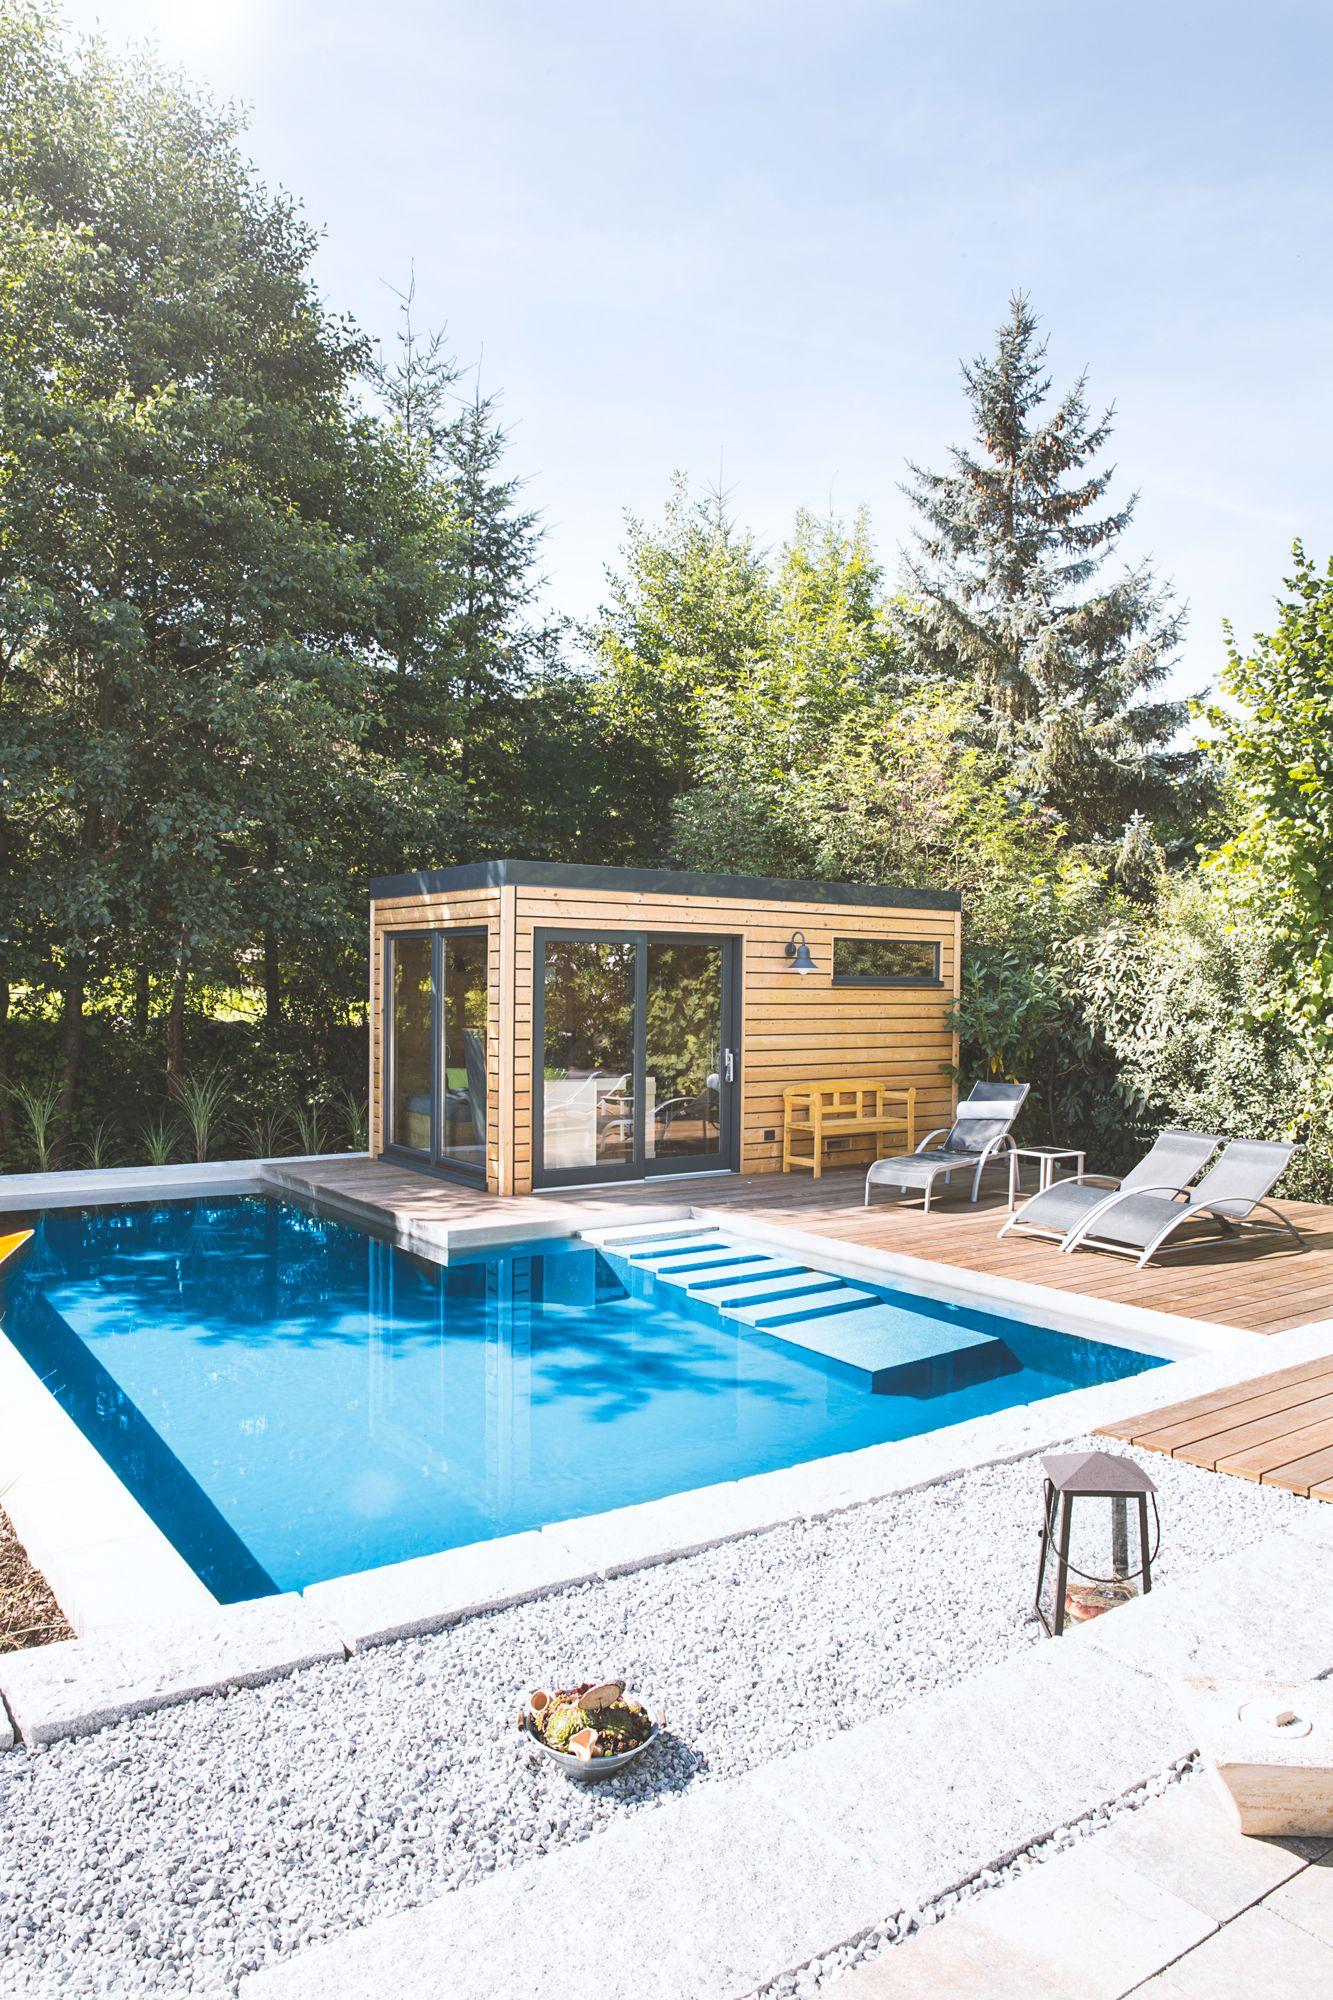 Warmegrad Gartensauna Modul L Gartensauna Aussensauna Sauna Im Garten